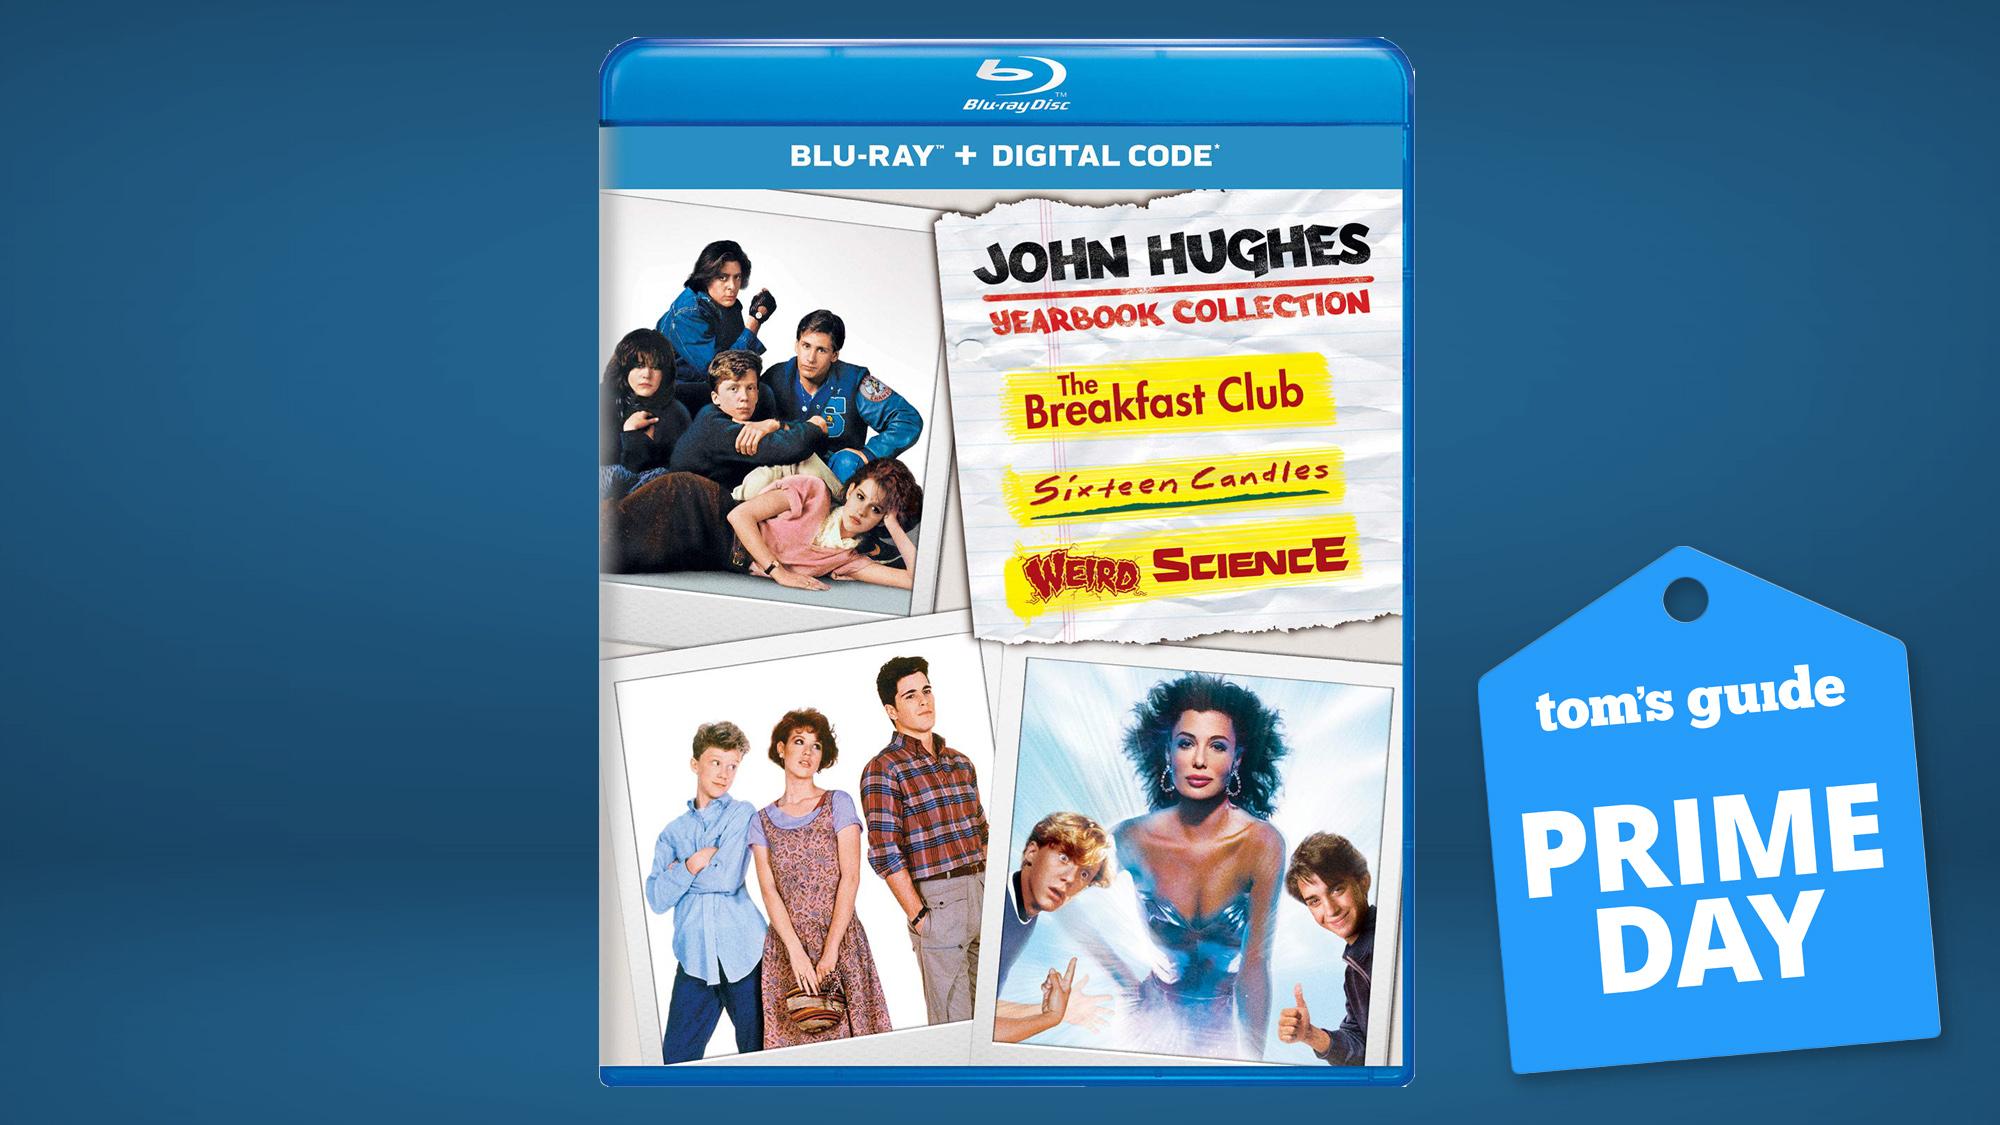 John Hughes trilogy